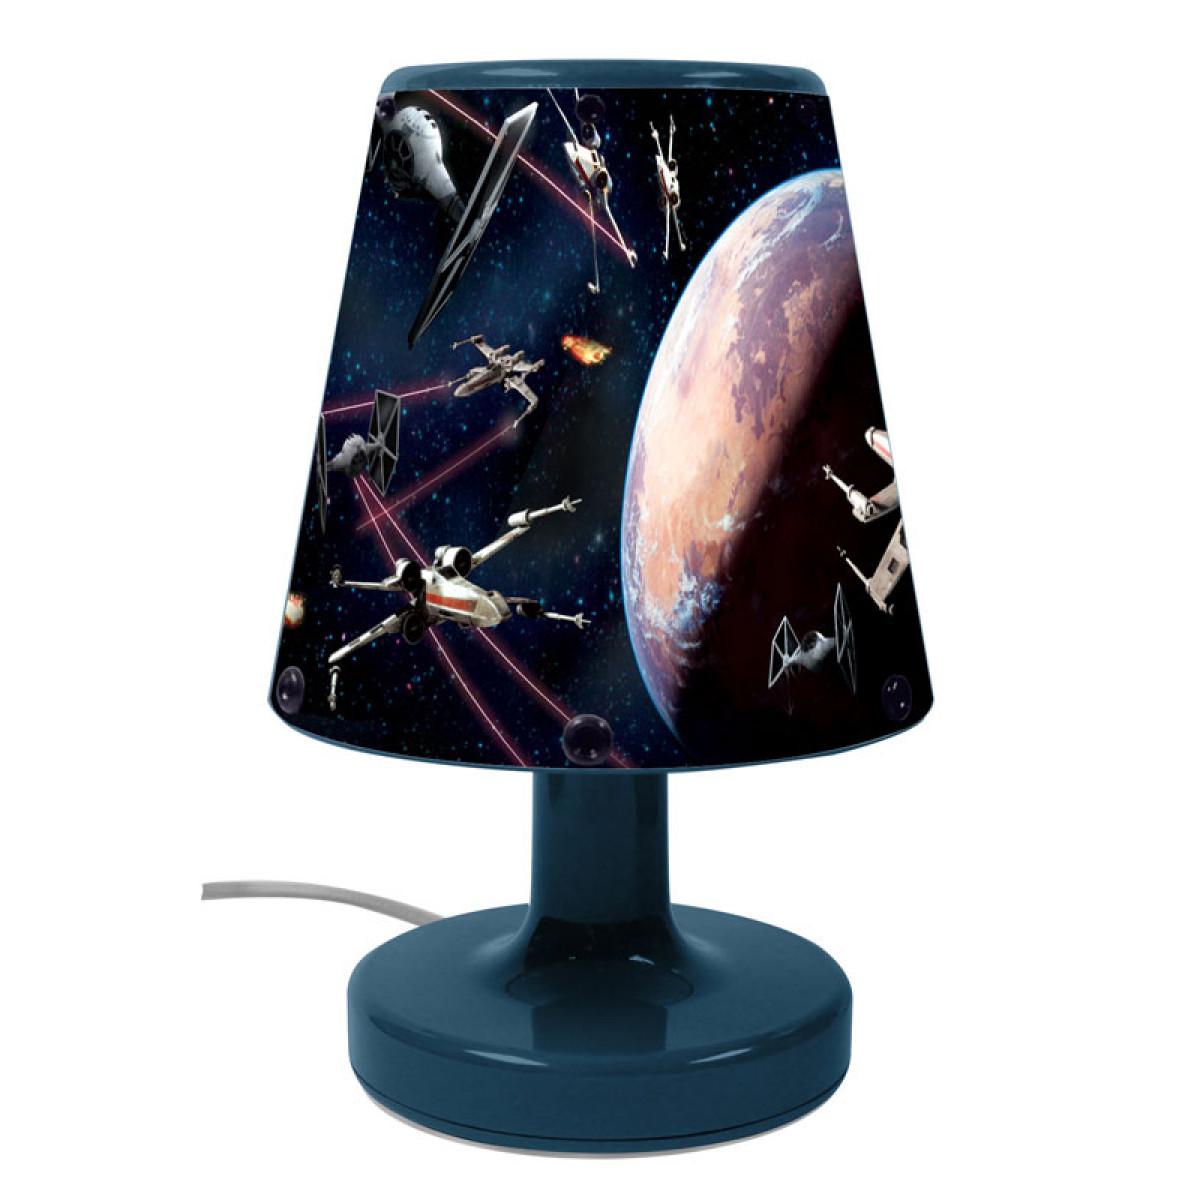 Star Wars Bedside Lamp Bedroom Lighting